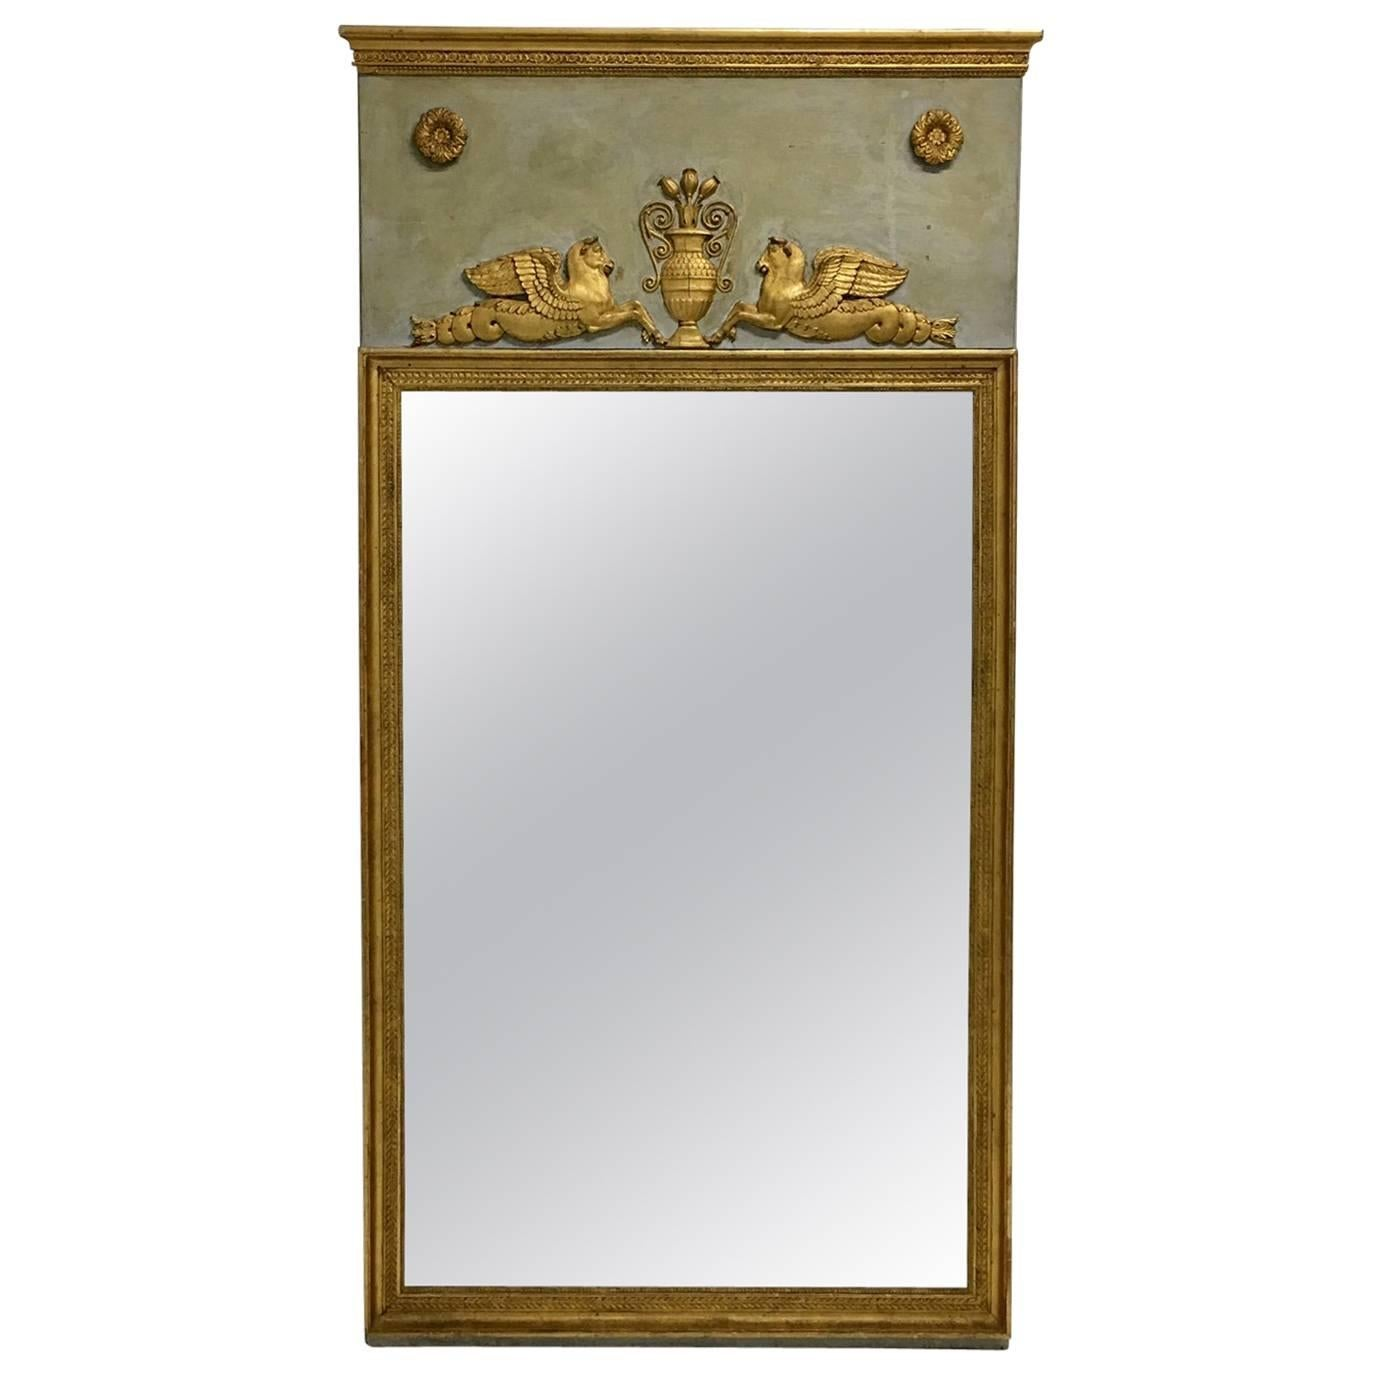 French Empire Period Trumeau Mirror